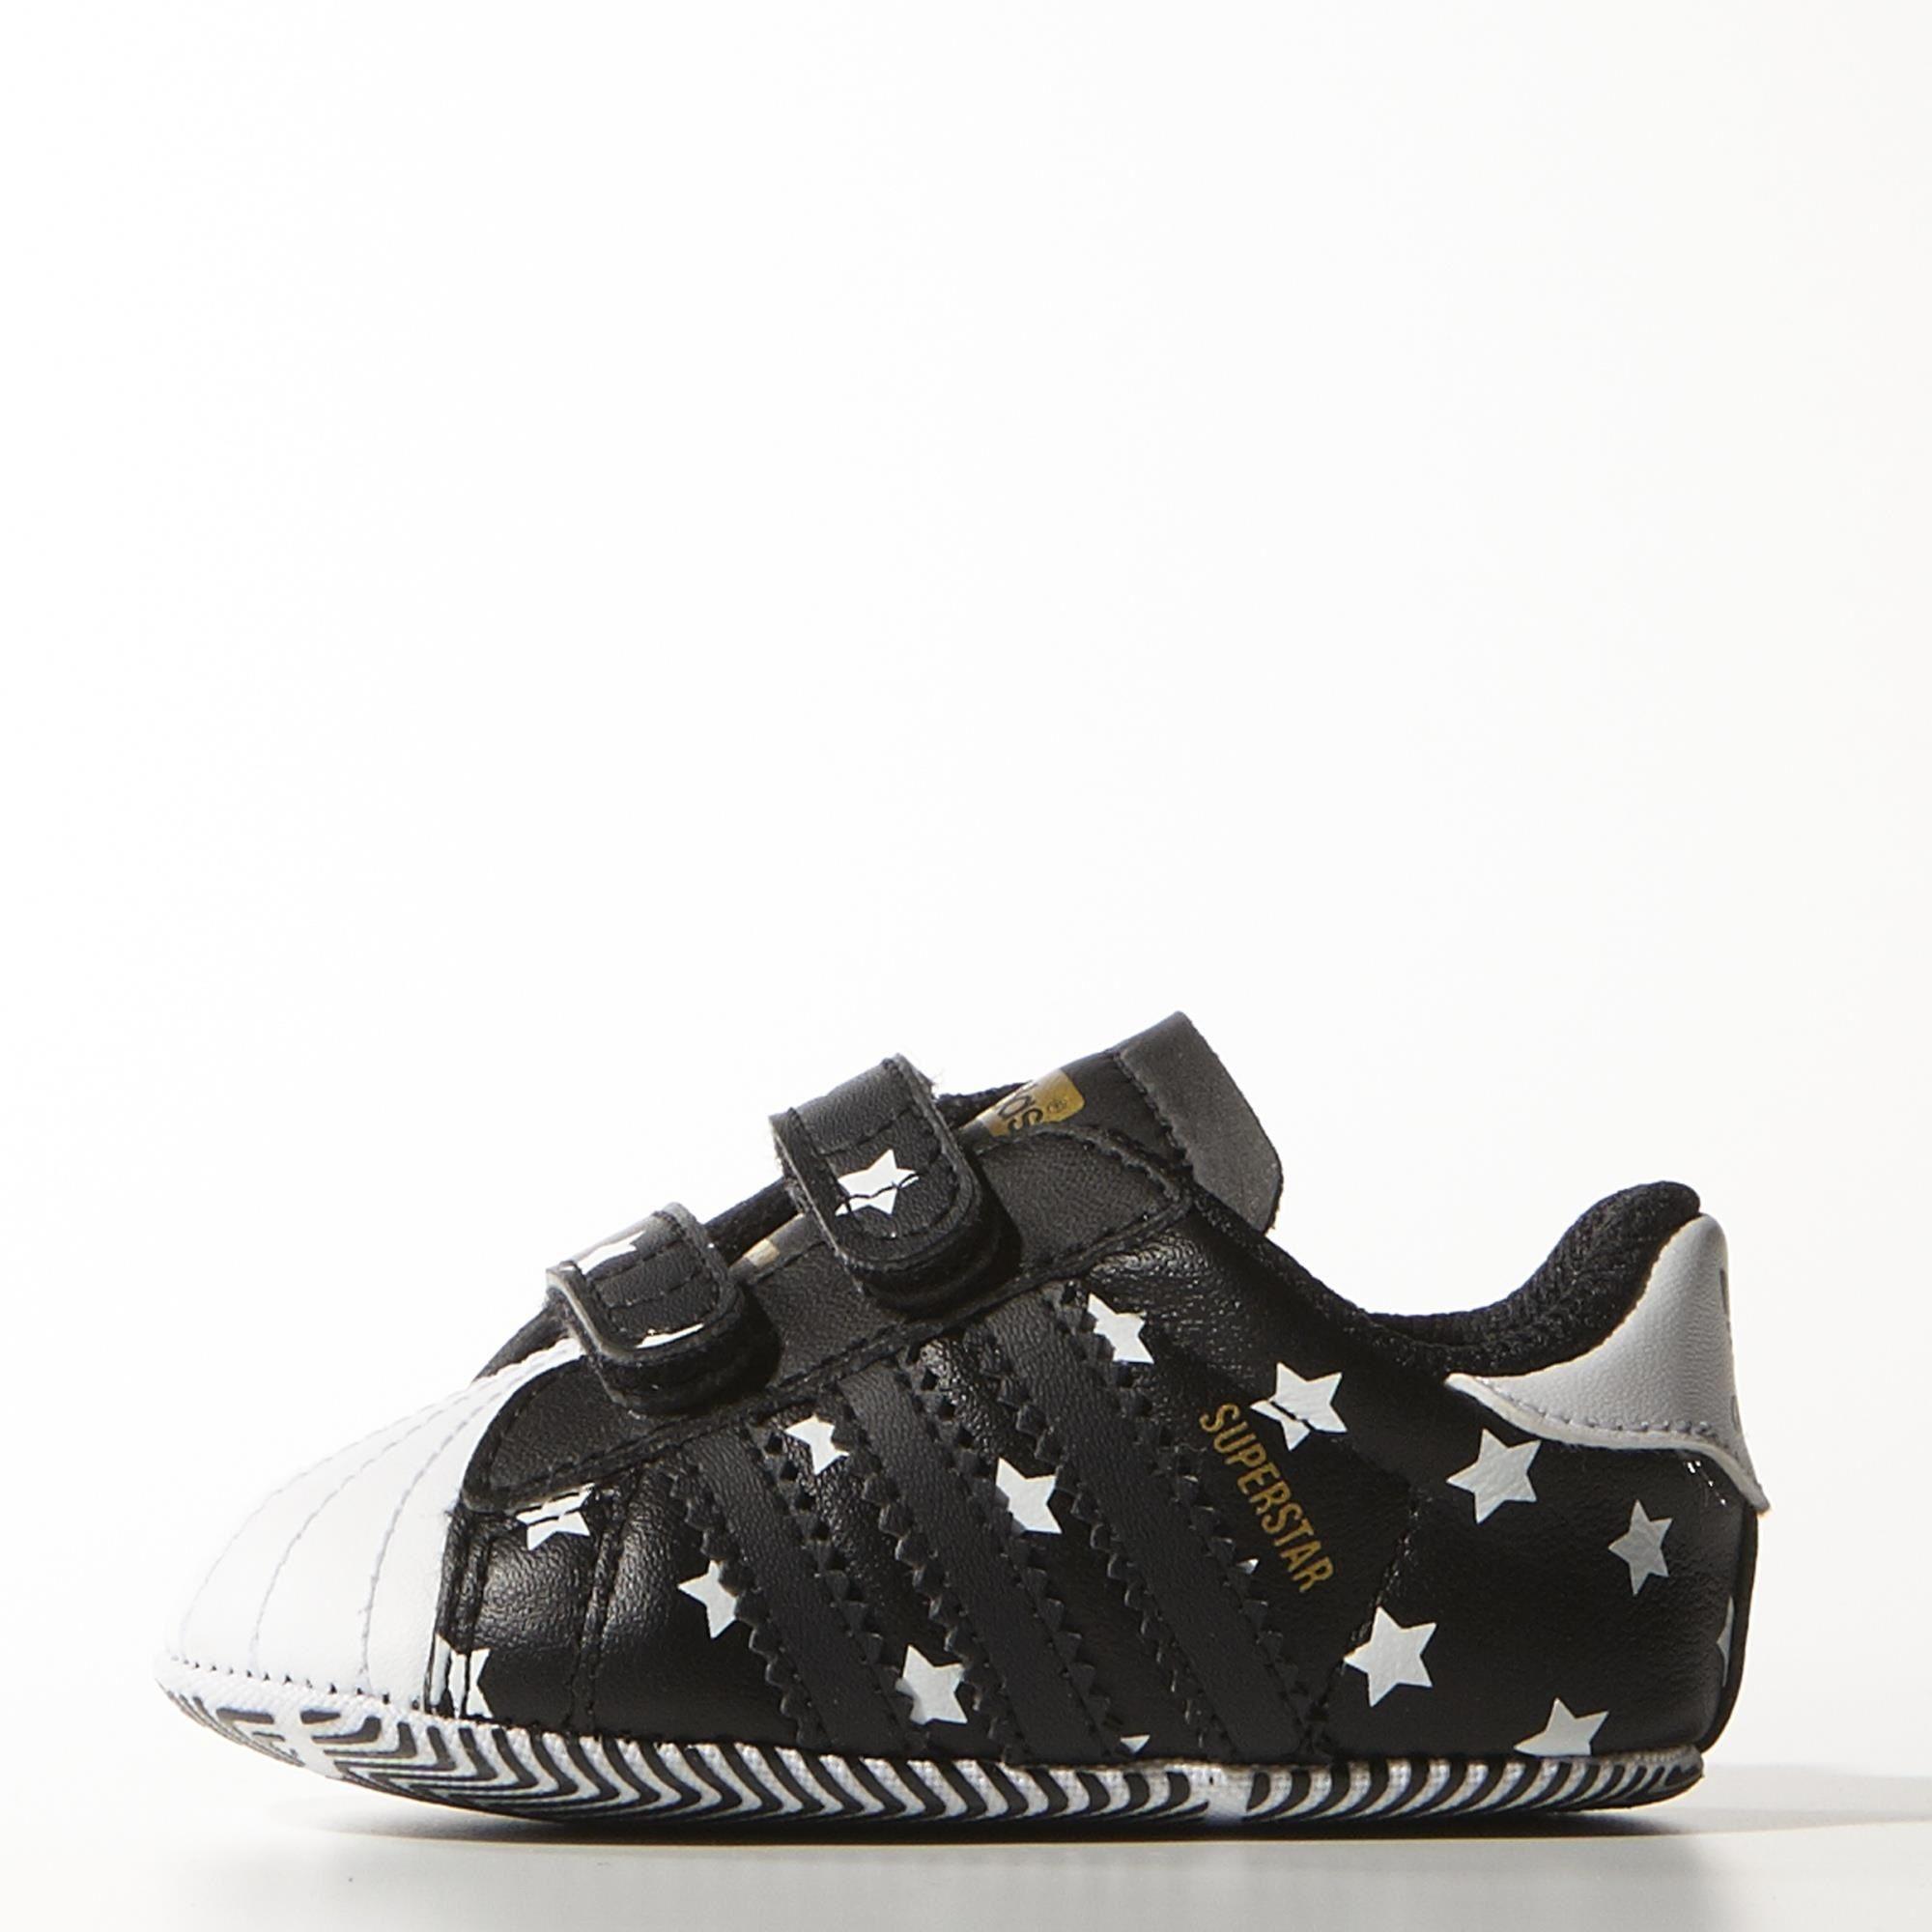 adidas original superstar crib shoe (france)